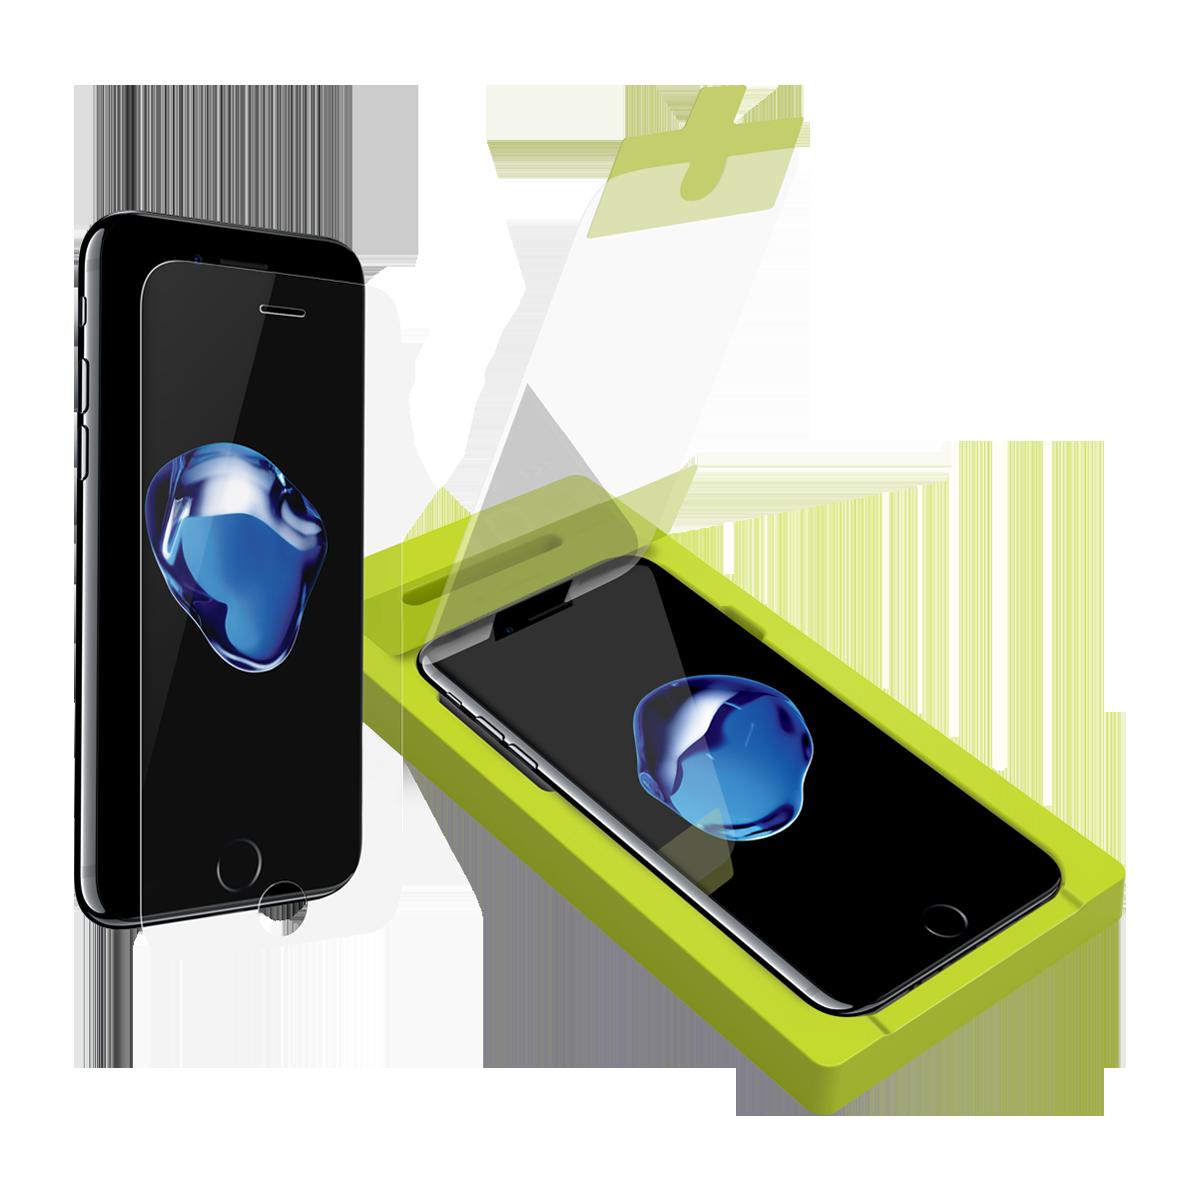 hot sale online ac994 adb90 PureGear tempered glass iPhone 7 Plus screen protector | Accessory ...